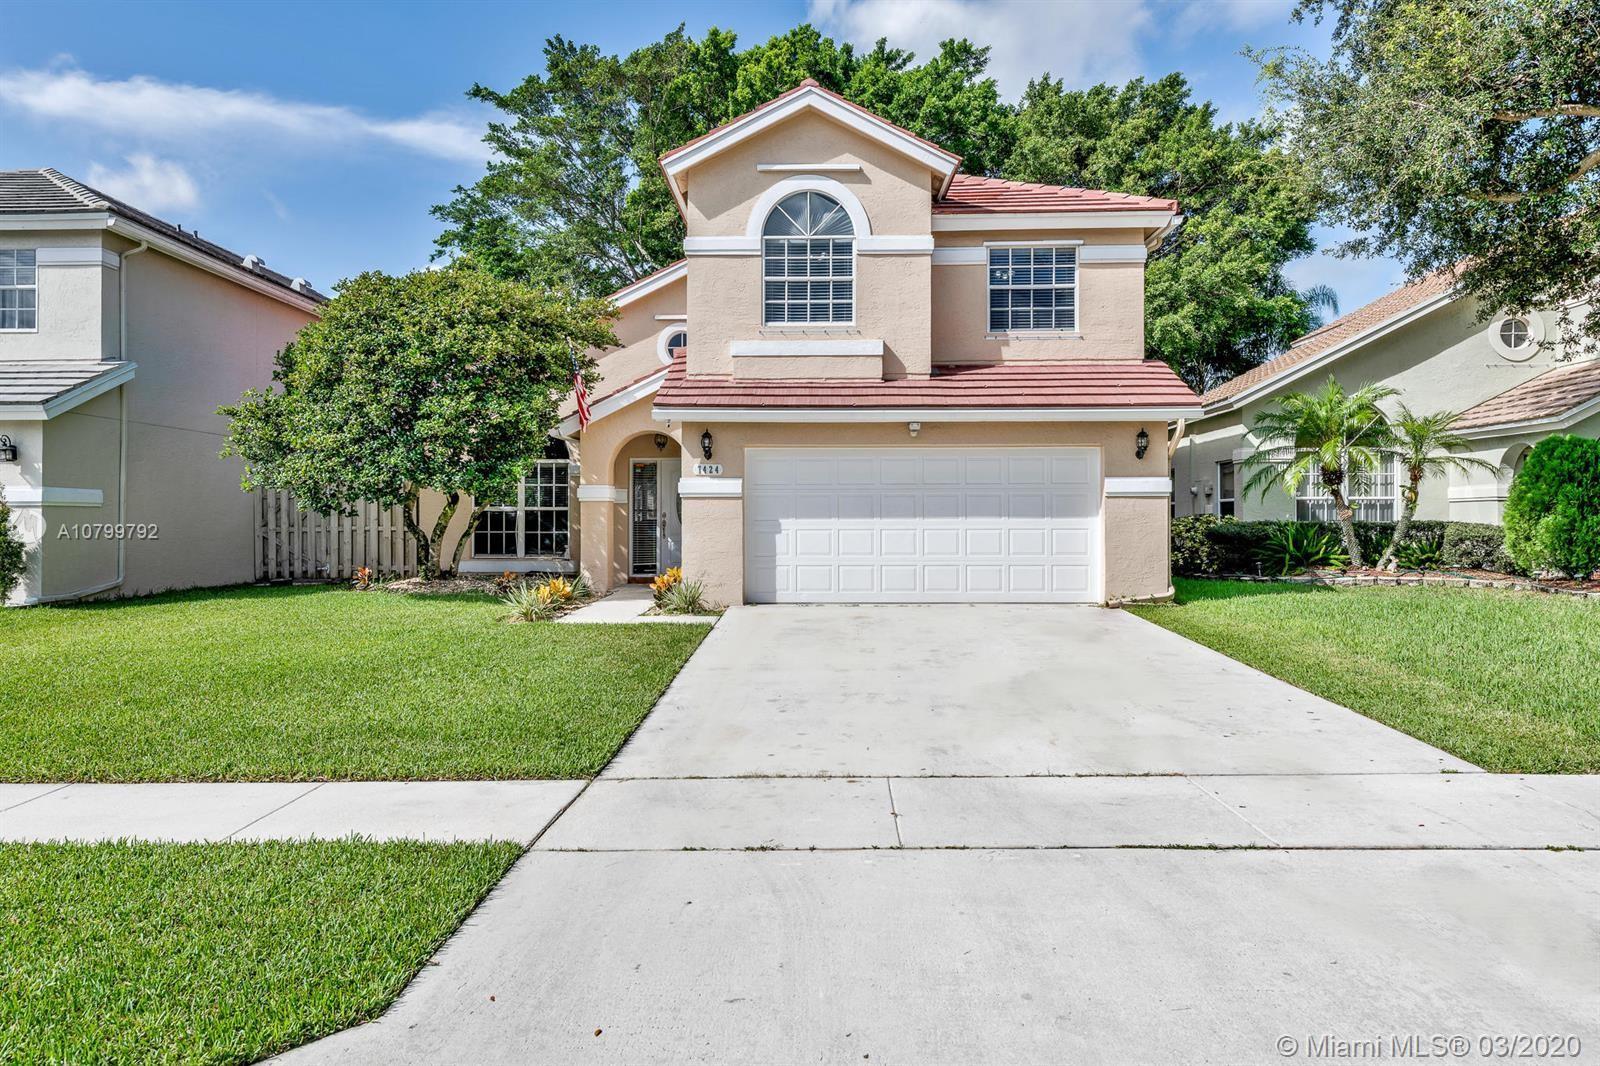 7424 Ashley Shores Cir, Lake Worth, FL 33467 - Lake Worth, FL real estate listing